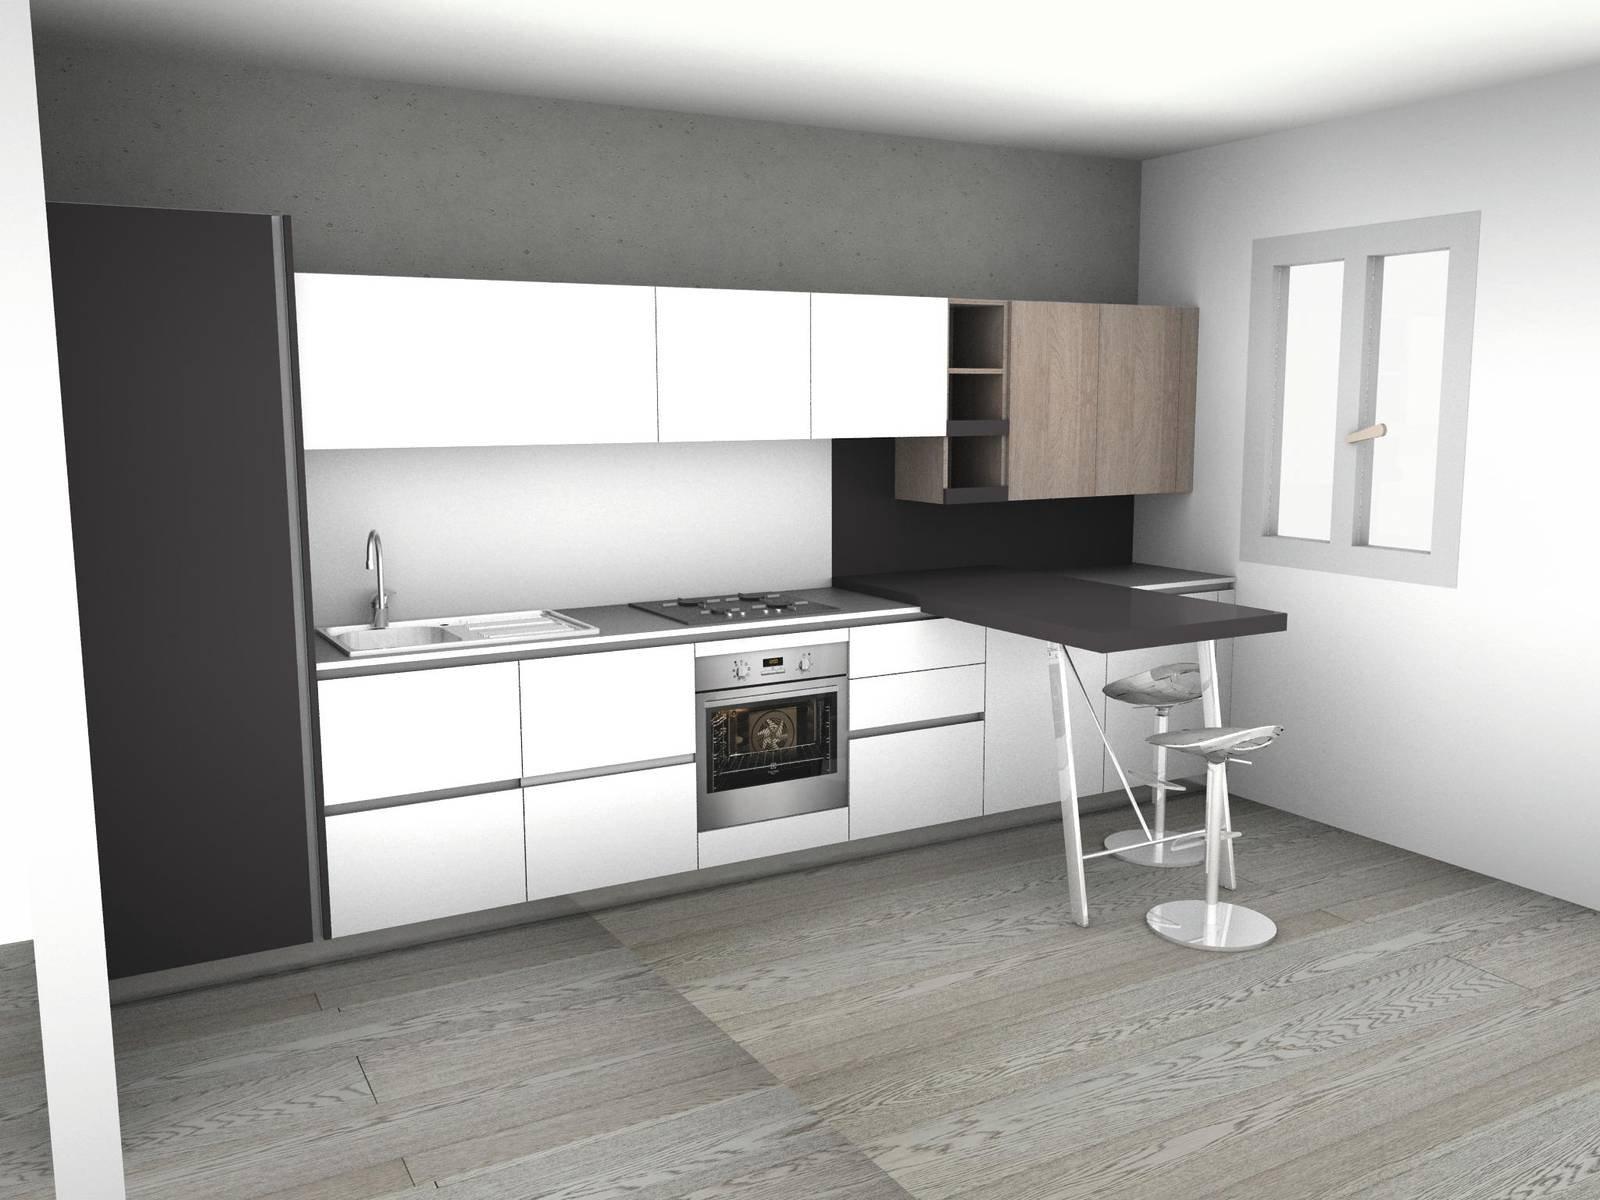 progetto cucina in muratura 3d cd45 regardsdefemmes